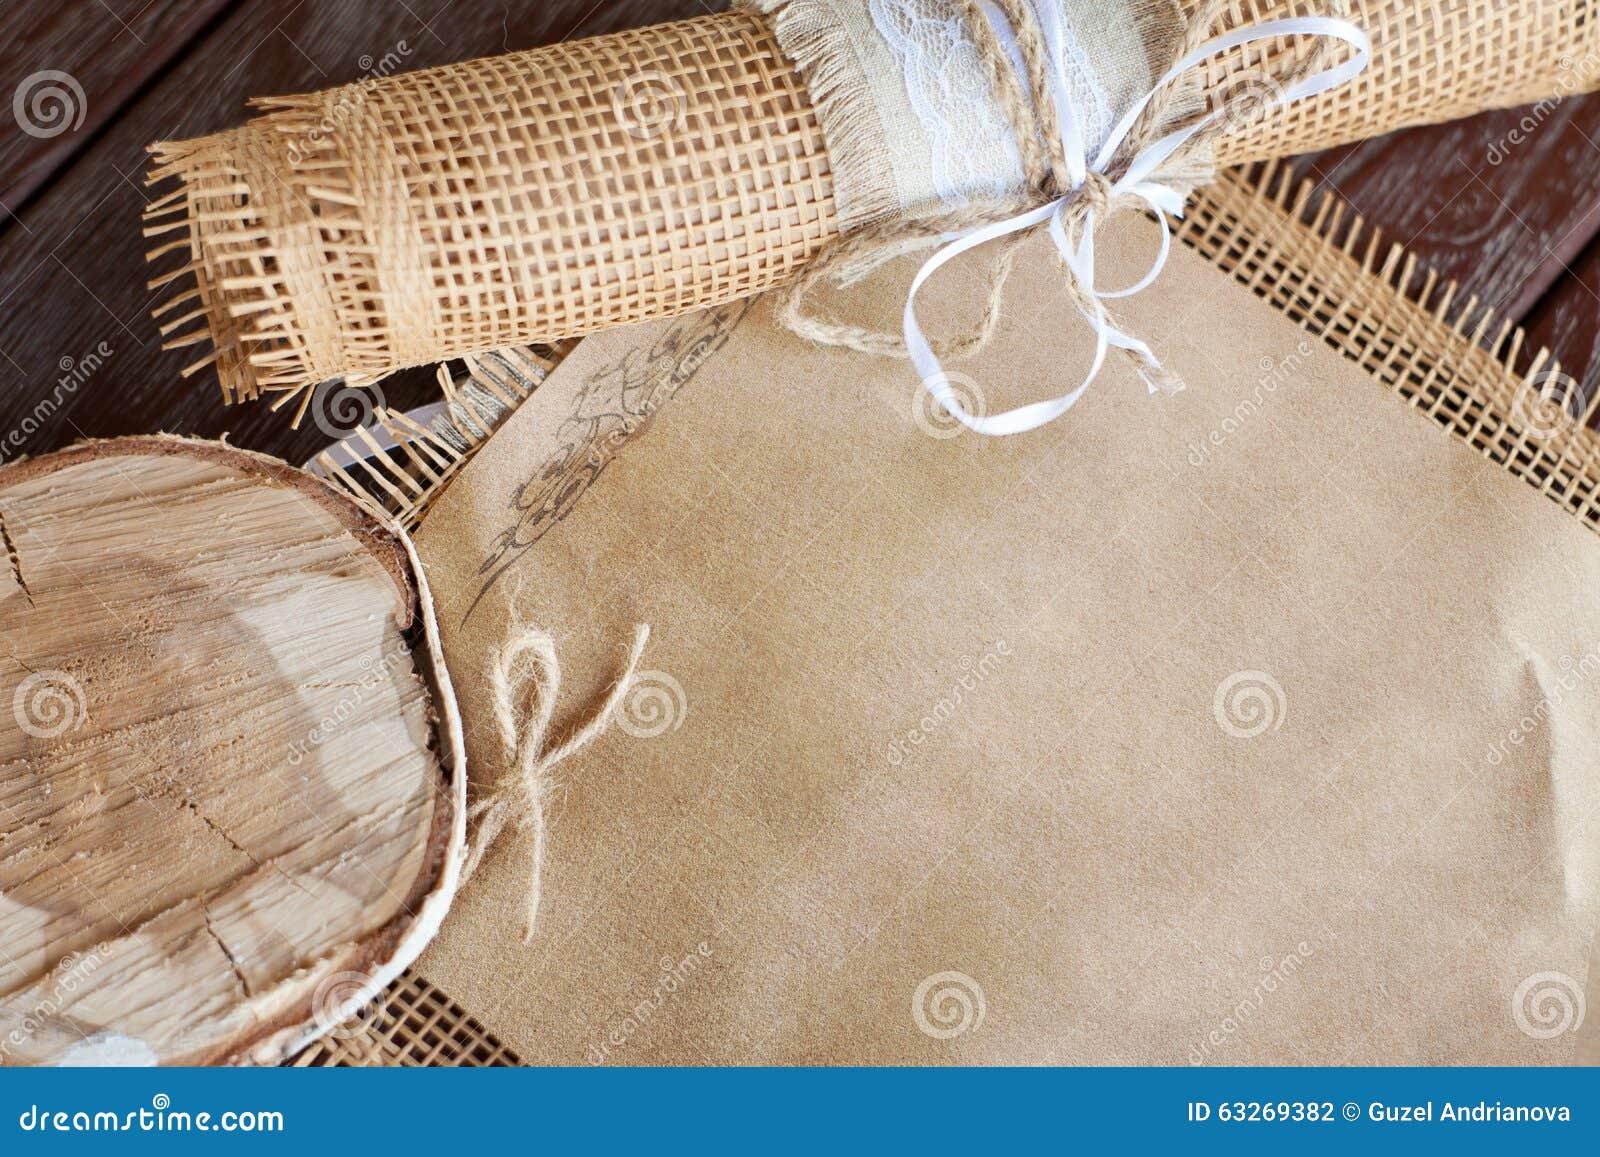 Wedding Invitation On Parchment Paper Stock Photo - Image: 63269382